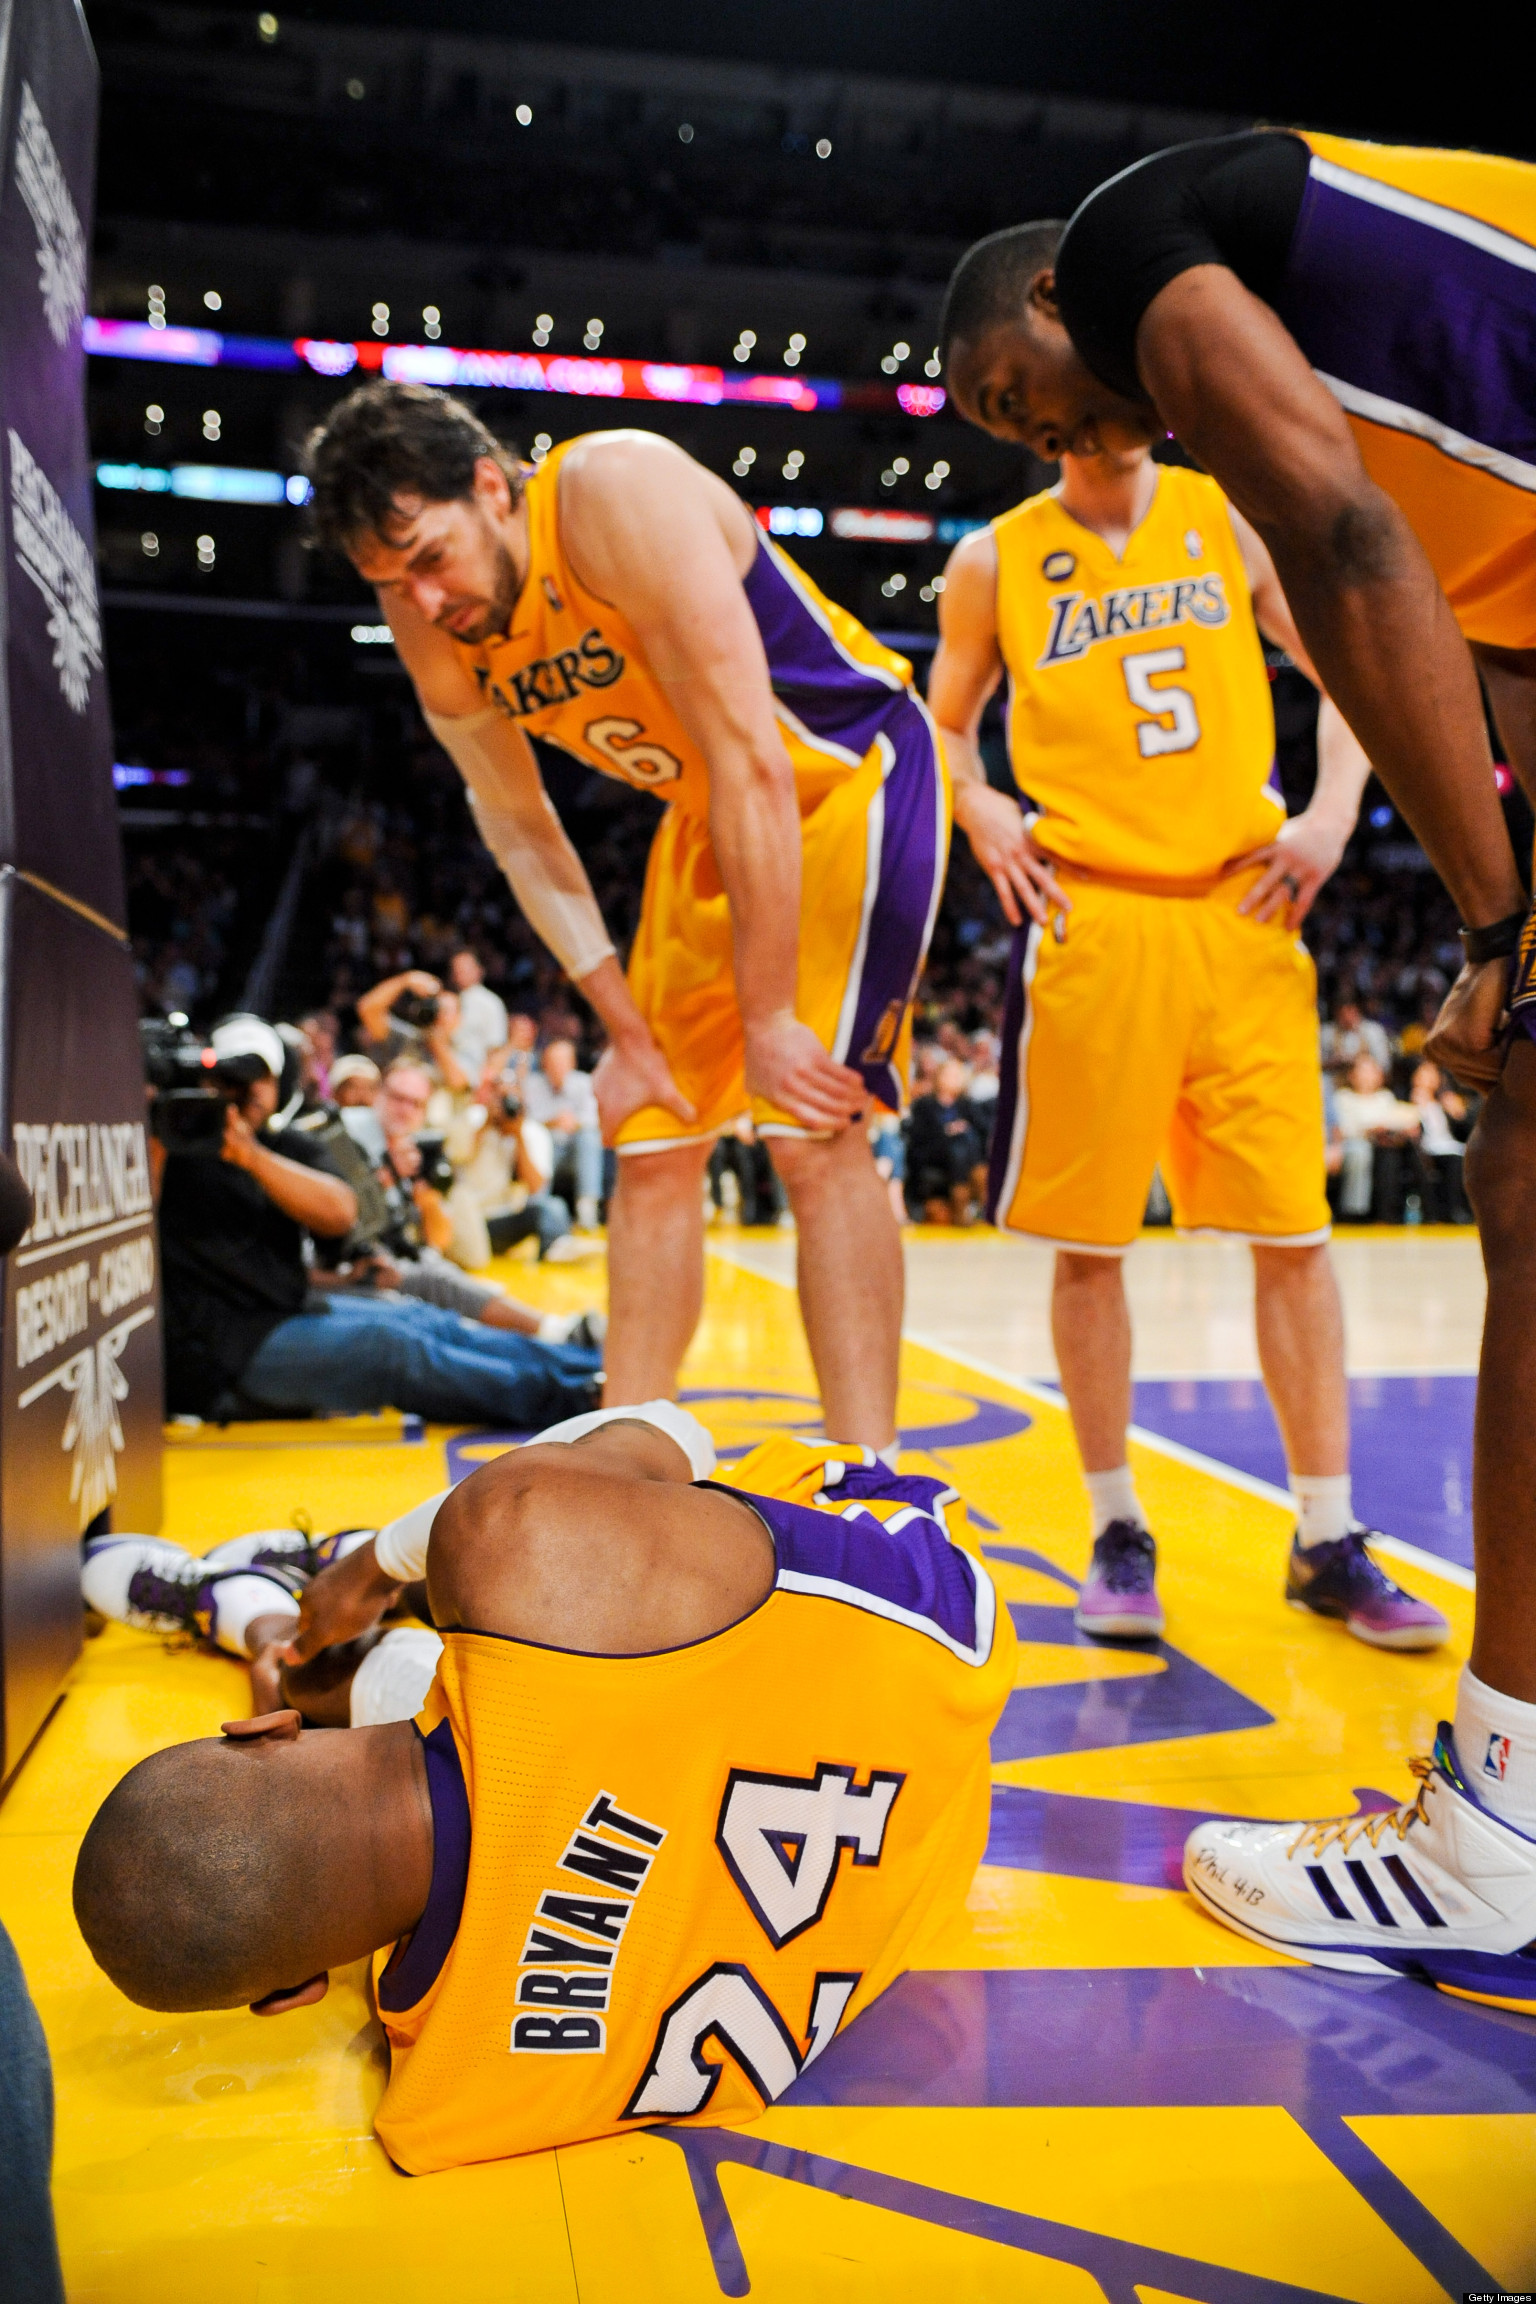 Kobe Bryant Torn Achilles Probable With MRI Scheduled To ... Kobe Bryant Injury